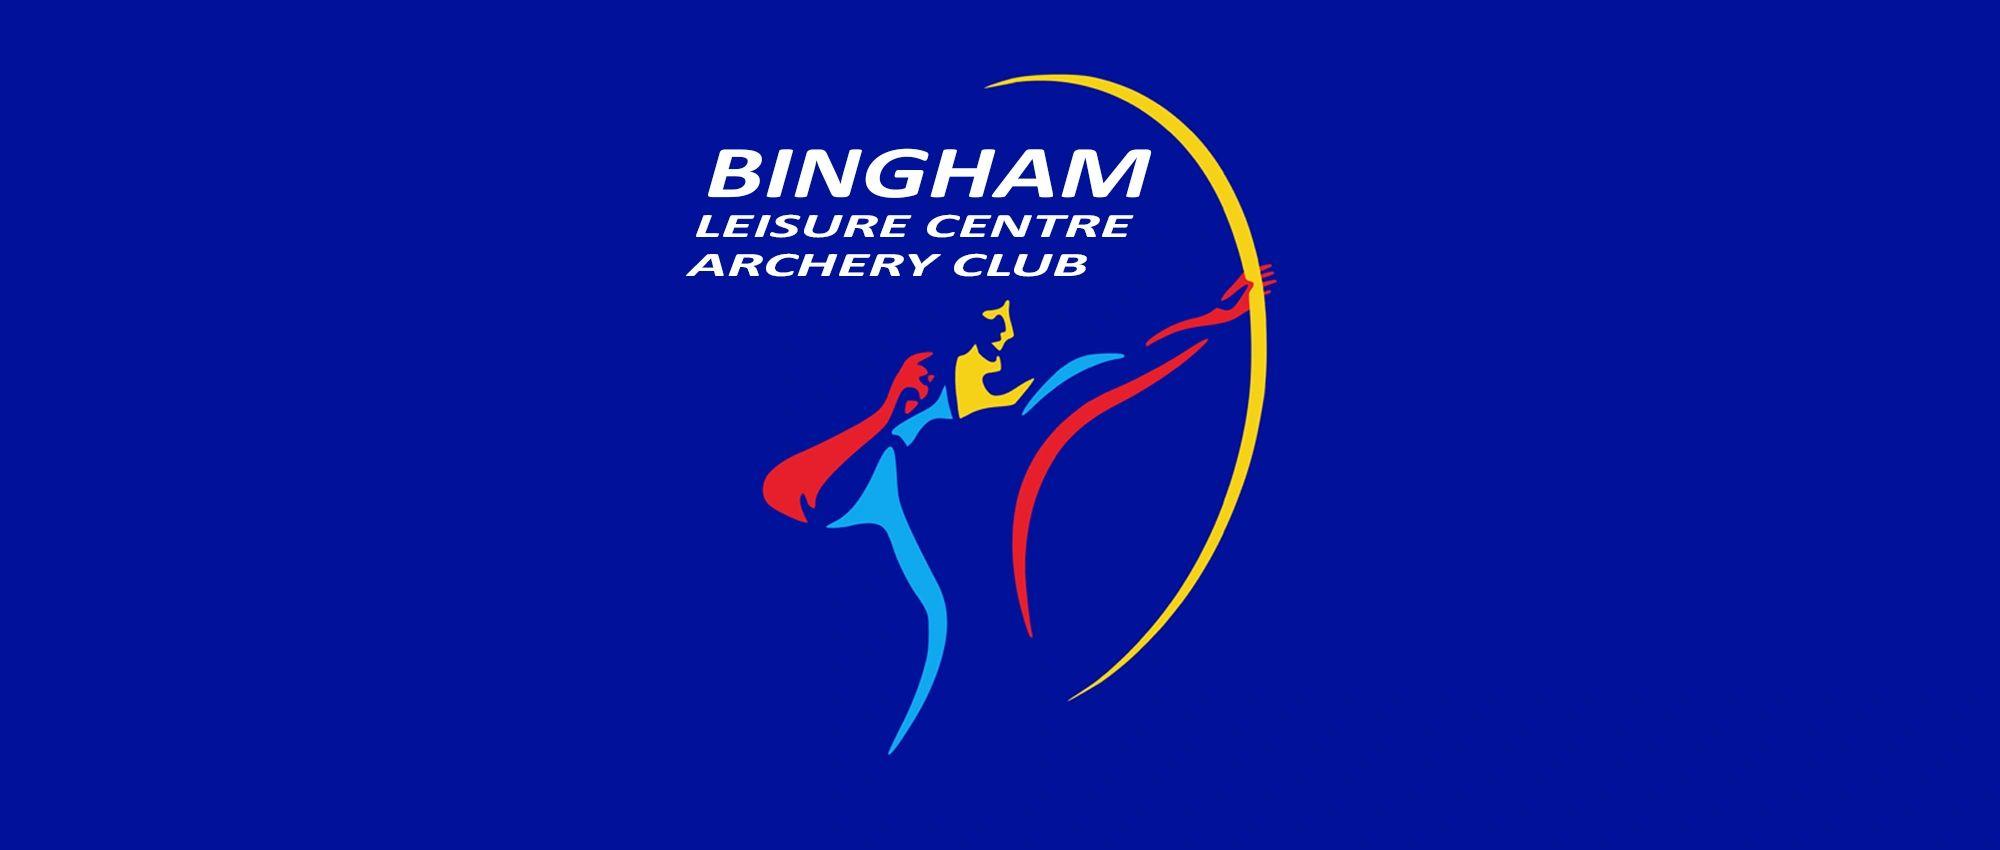 Bingham Leisure Centre Archery Club - Home